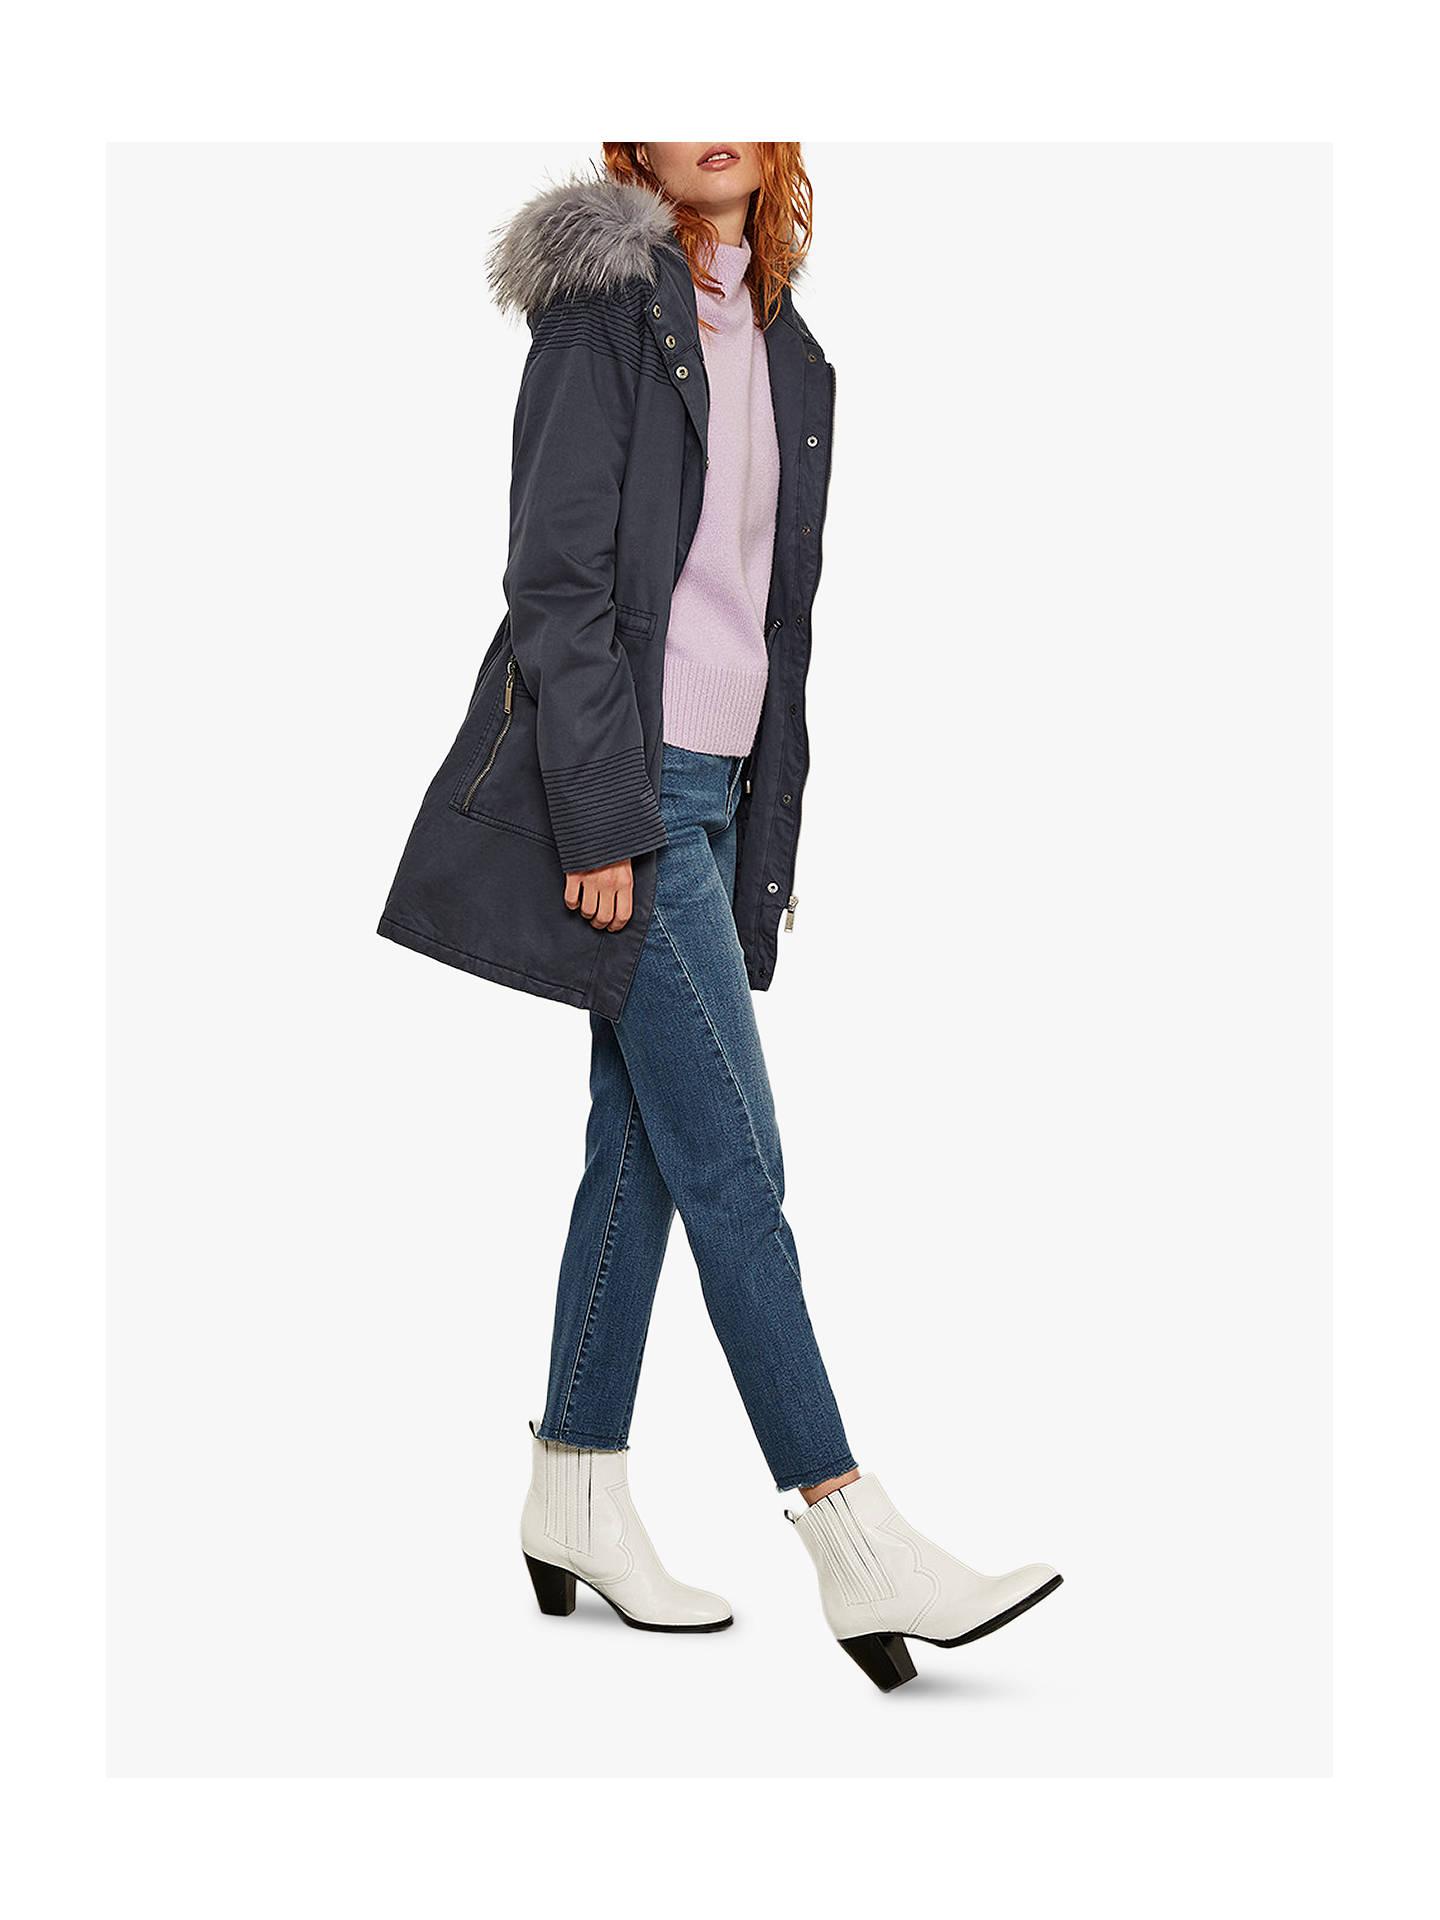 67b37f638ec5 Mint Velvet Sophie Leather Cowboy Ankle Boots, White at John Lewis ...